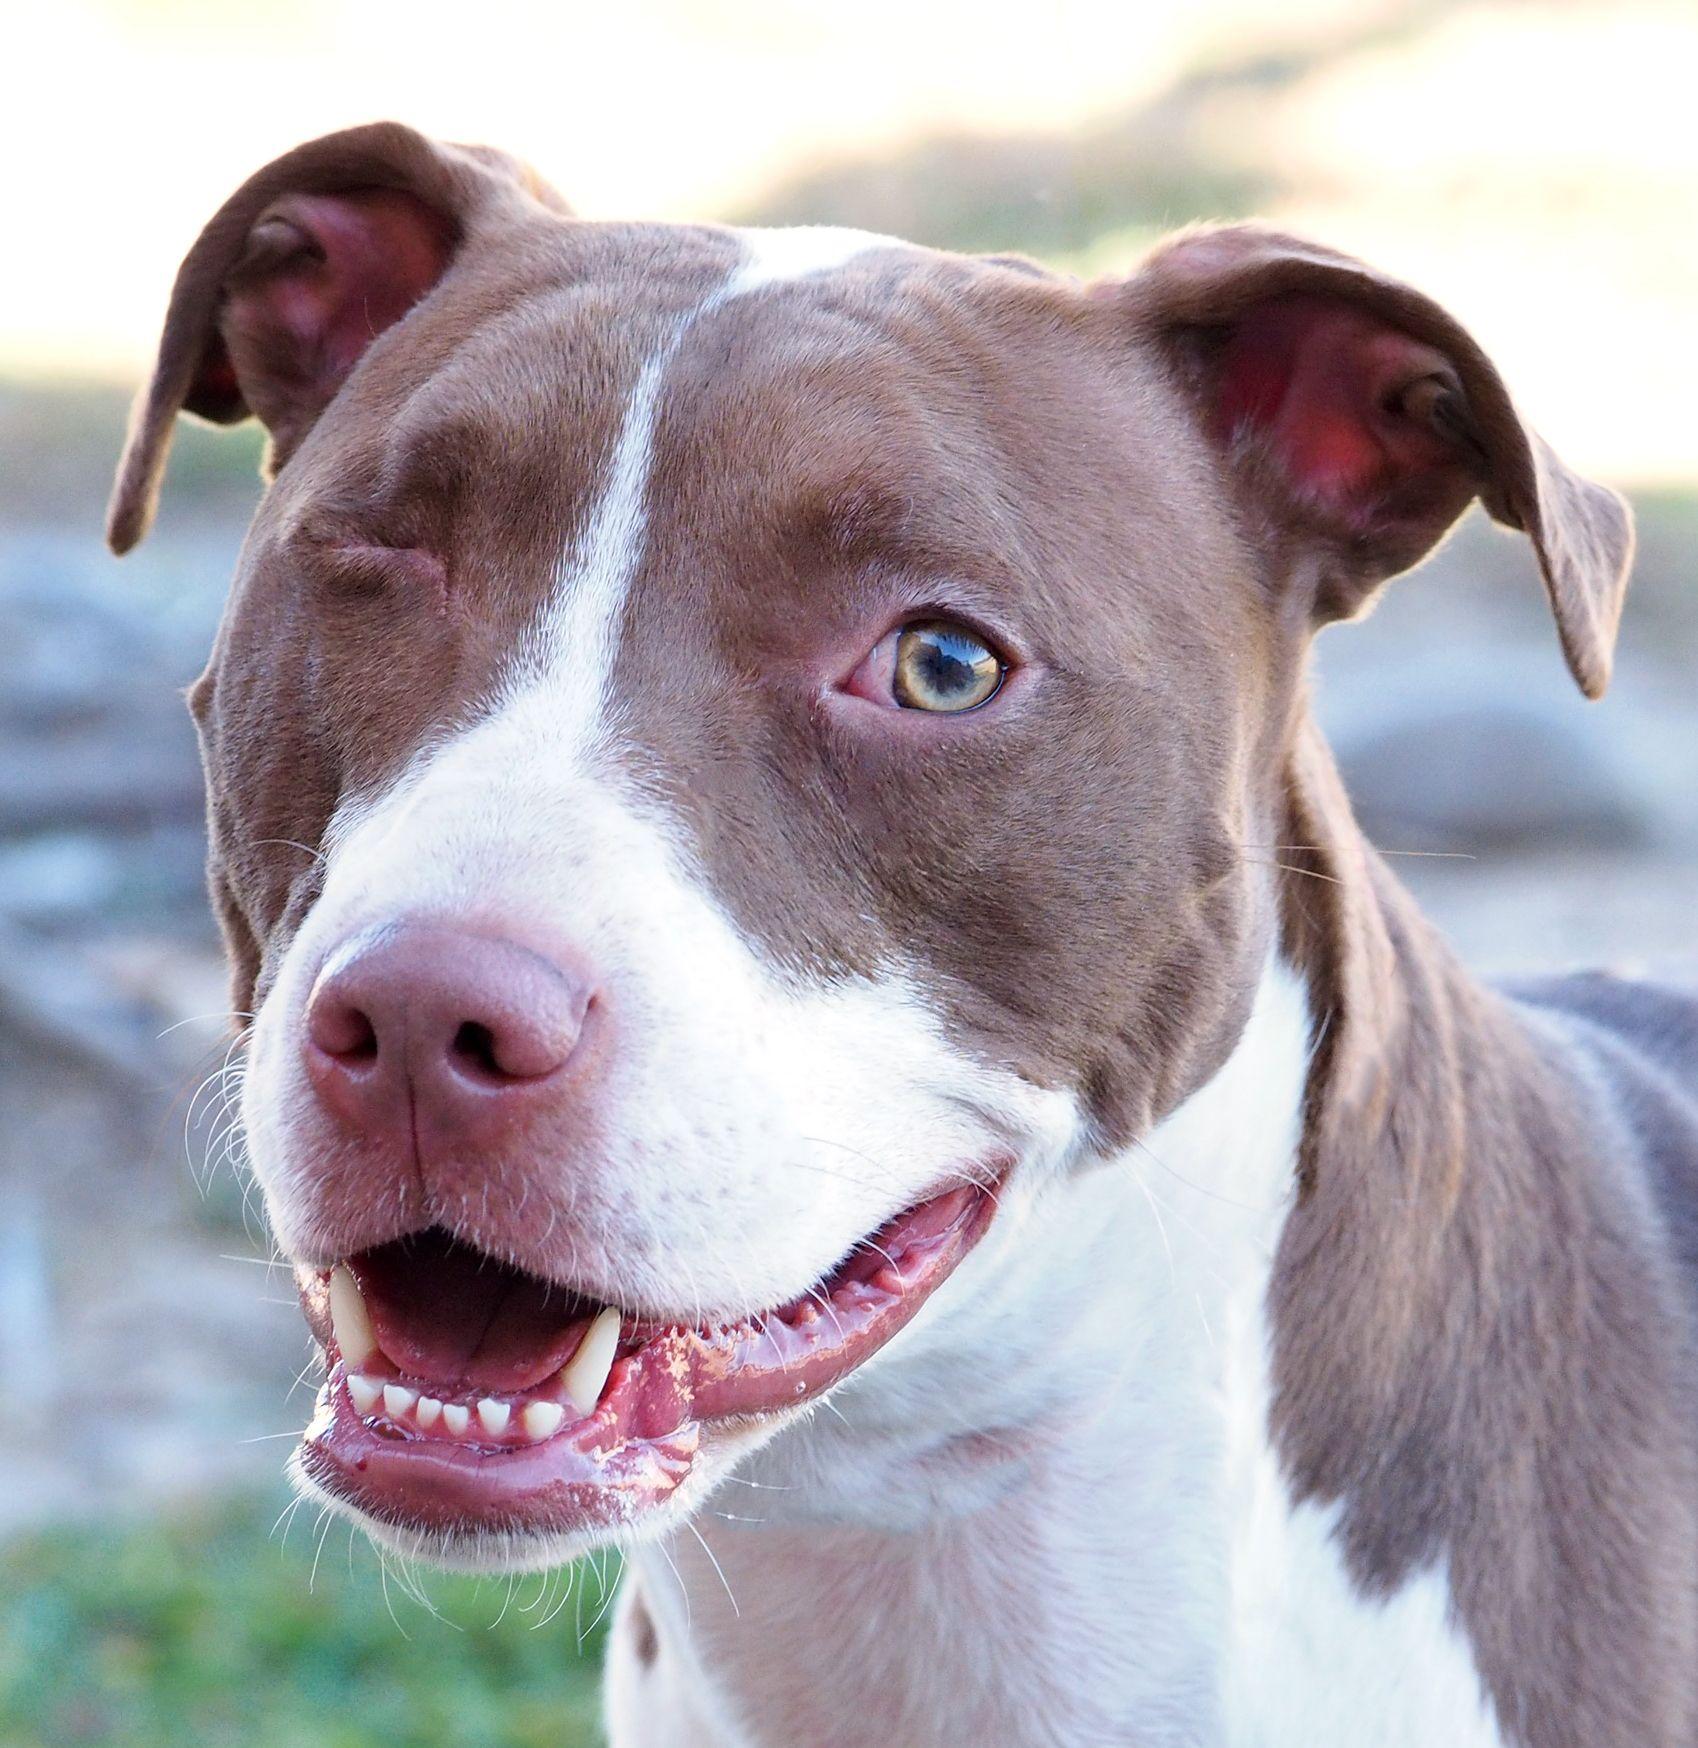 Dogs image by San Antonio Humane Society on SAHS Dogs